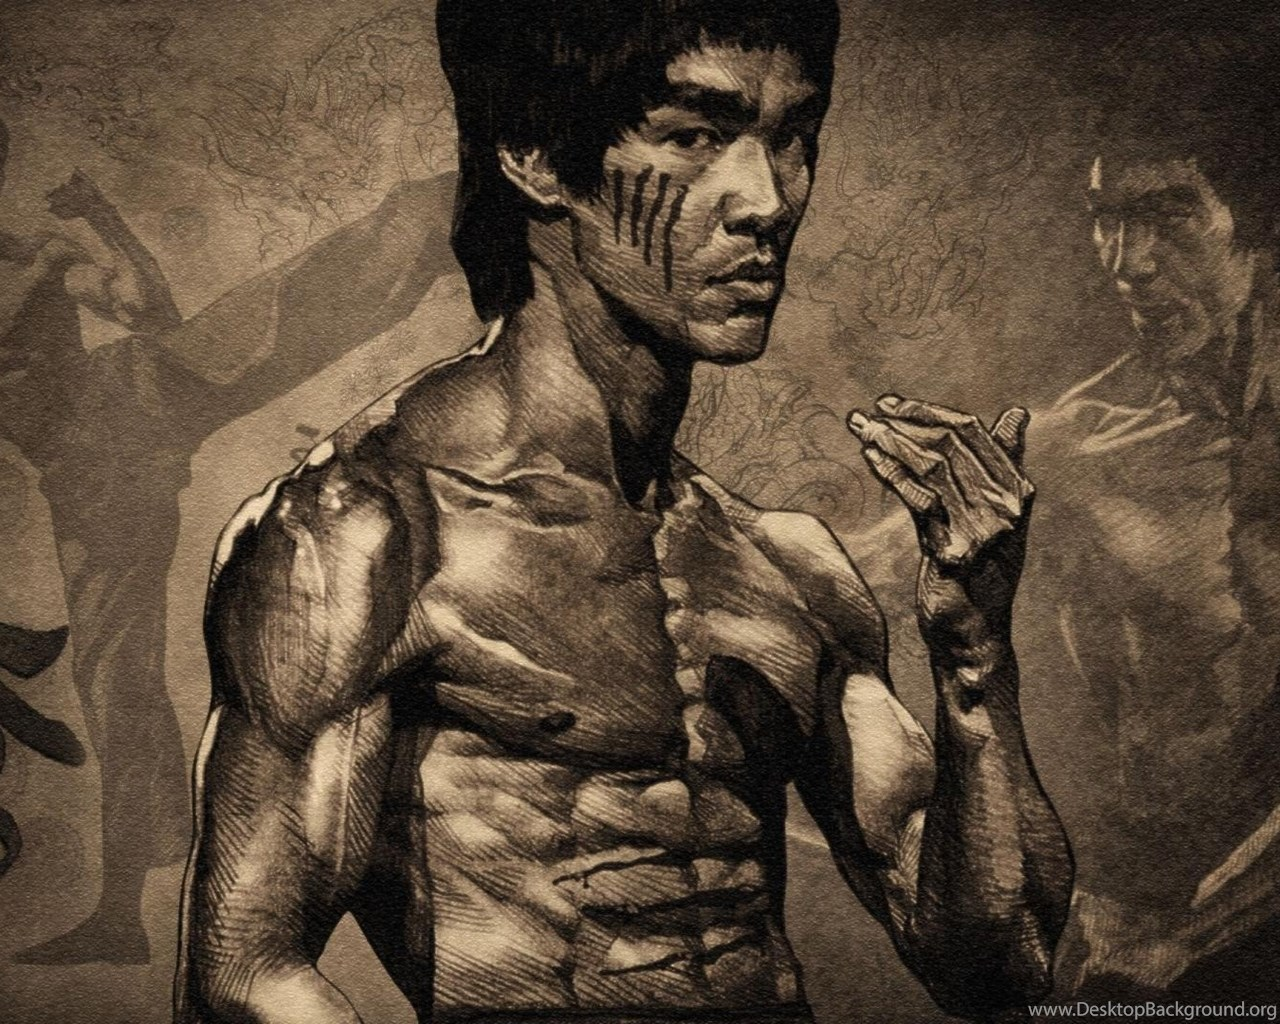 Download Bruce Lee Wallpapers For Iphone Desktop Background